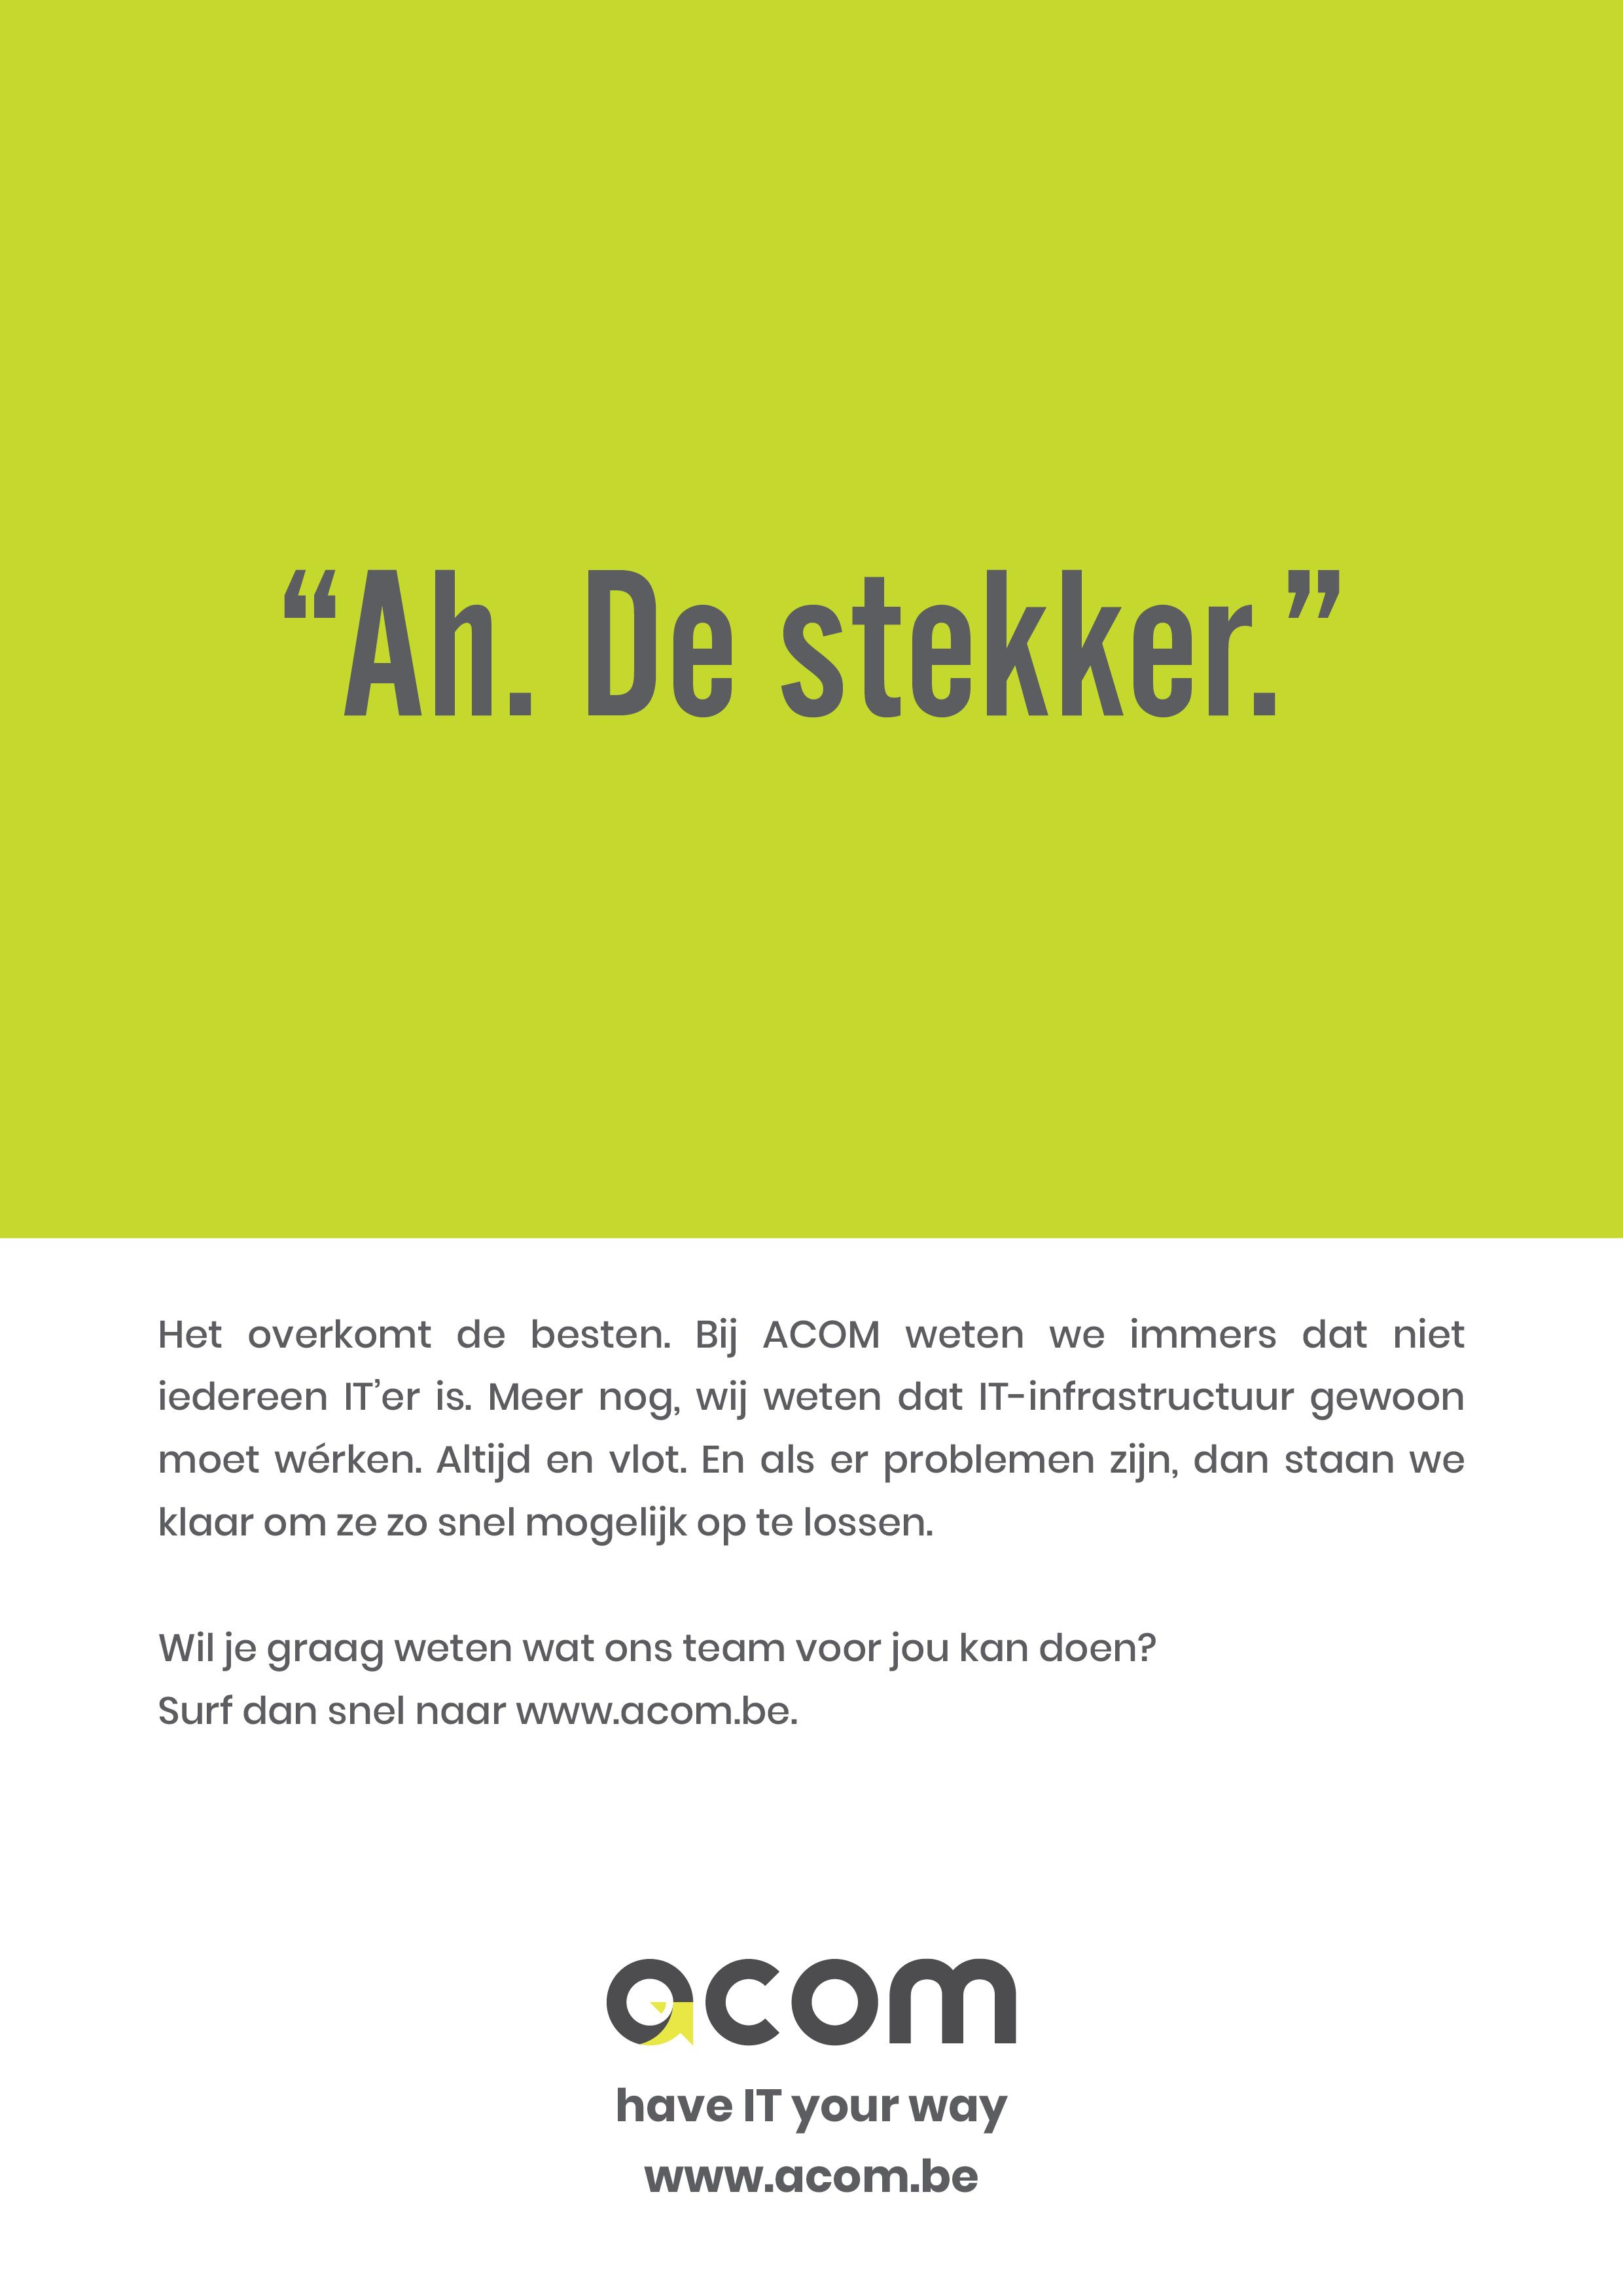 ACOM-CAMPAIGN-GRAPHIC-WEB3.jpg